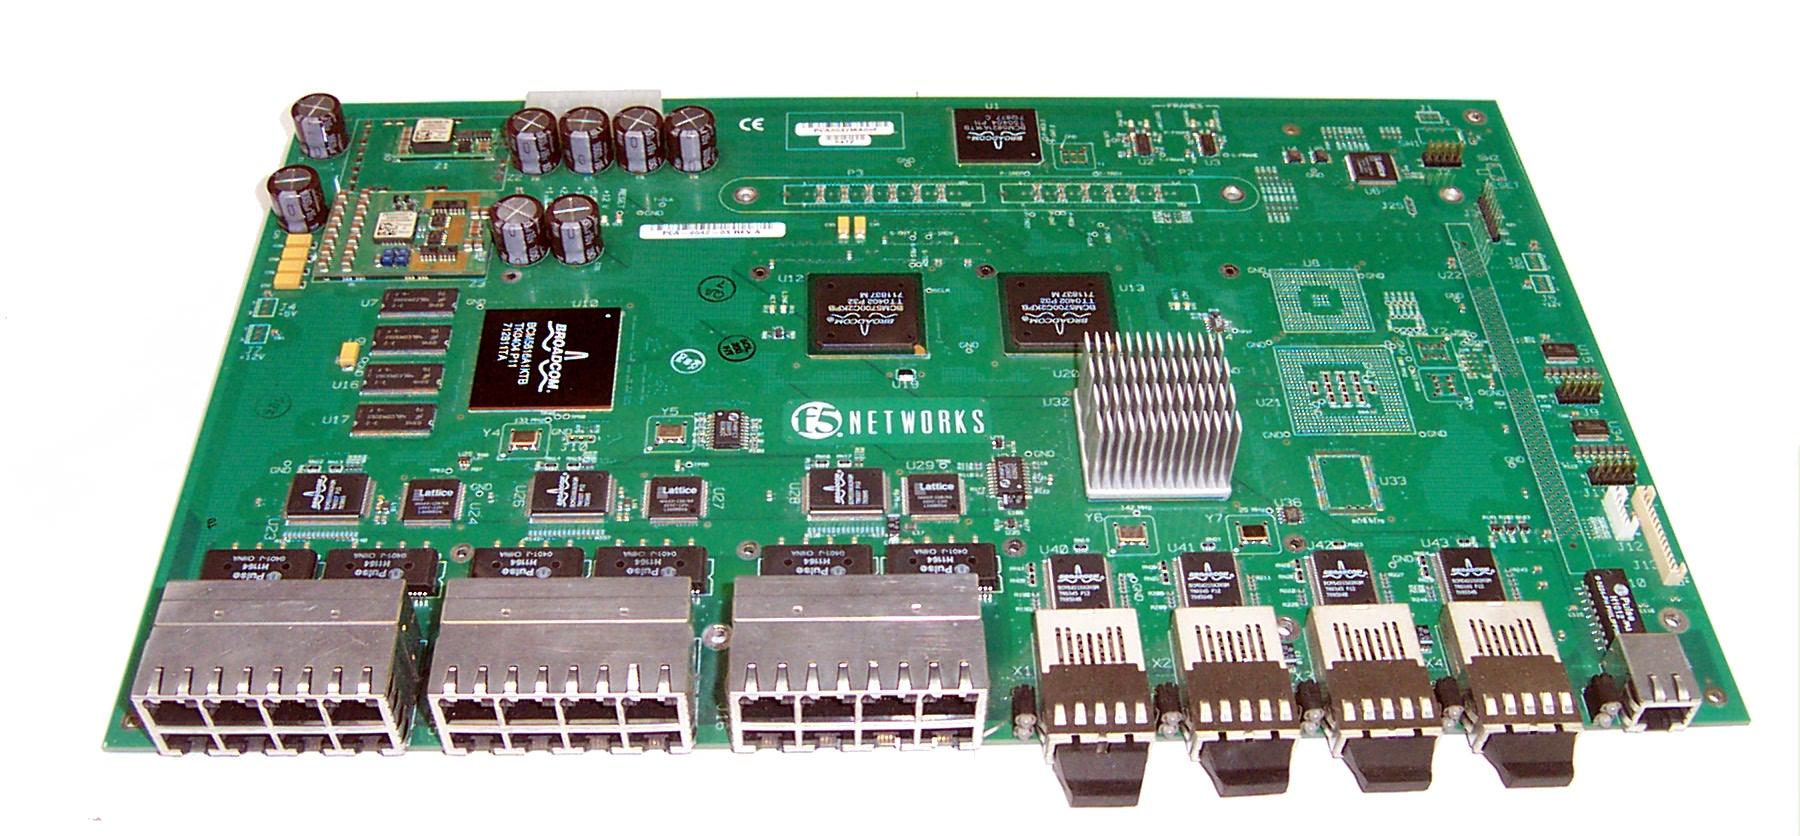 F5 Networks PCA-0042-03 Ethernet & Fibre Channel Board